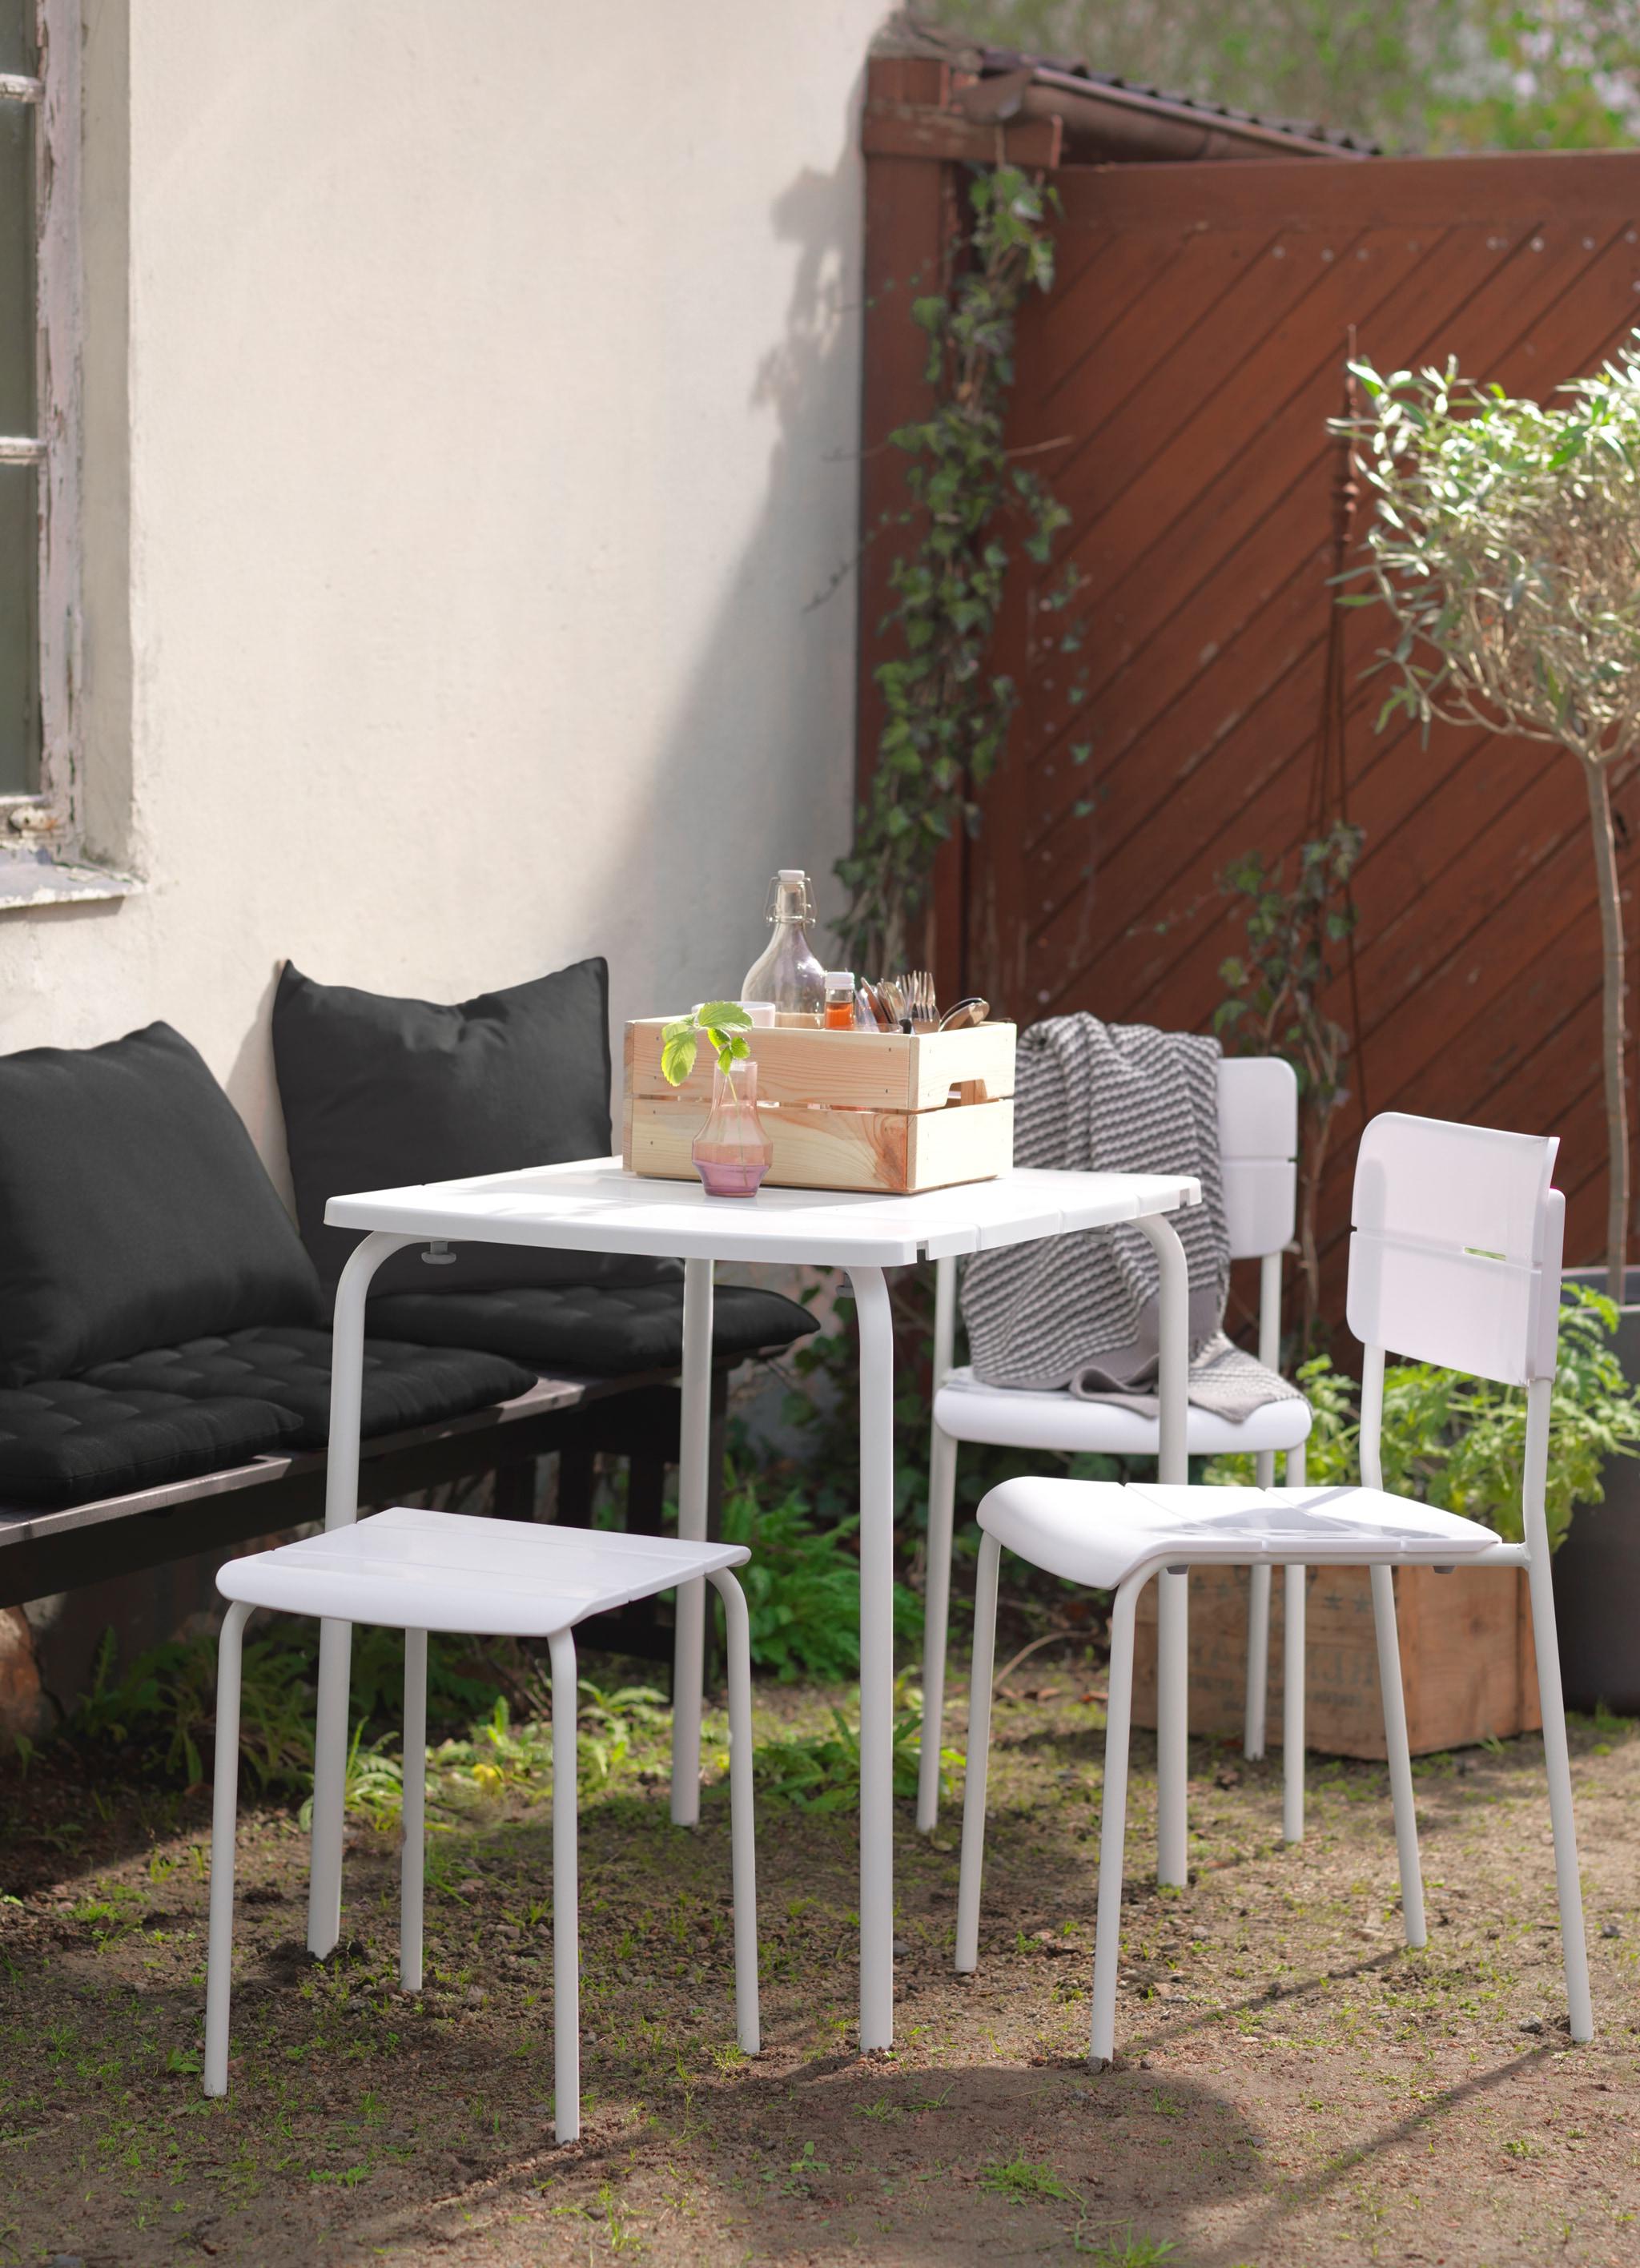 Ikea Sillas Jardin S5d8 Muebles De Jardà N Y Terraza Muebles De Exterior Pra Online Ikea